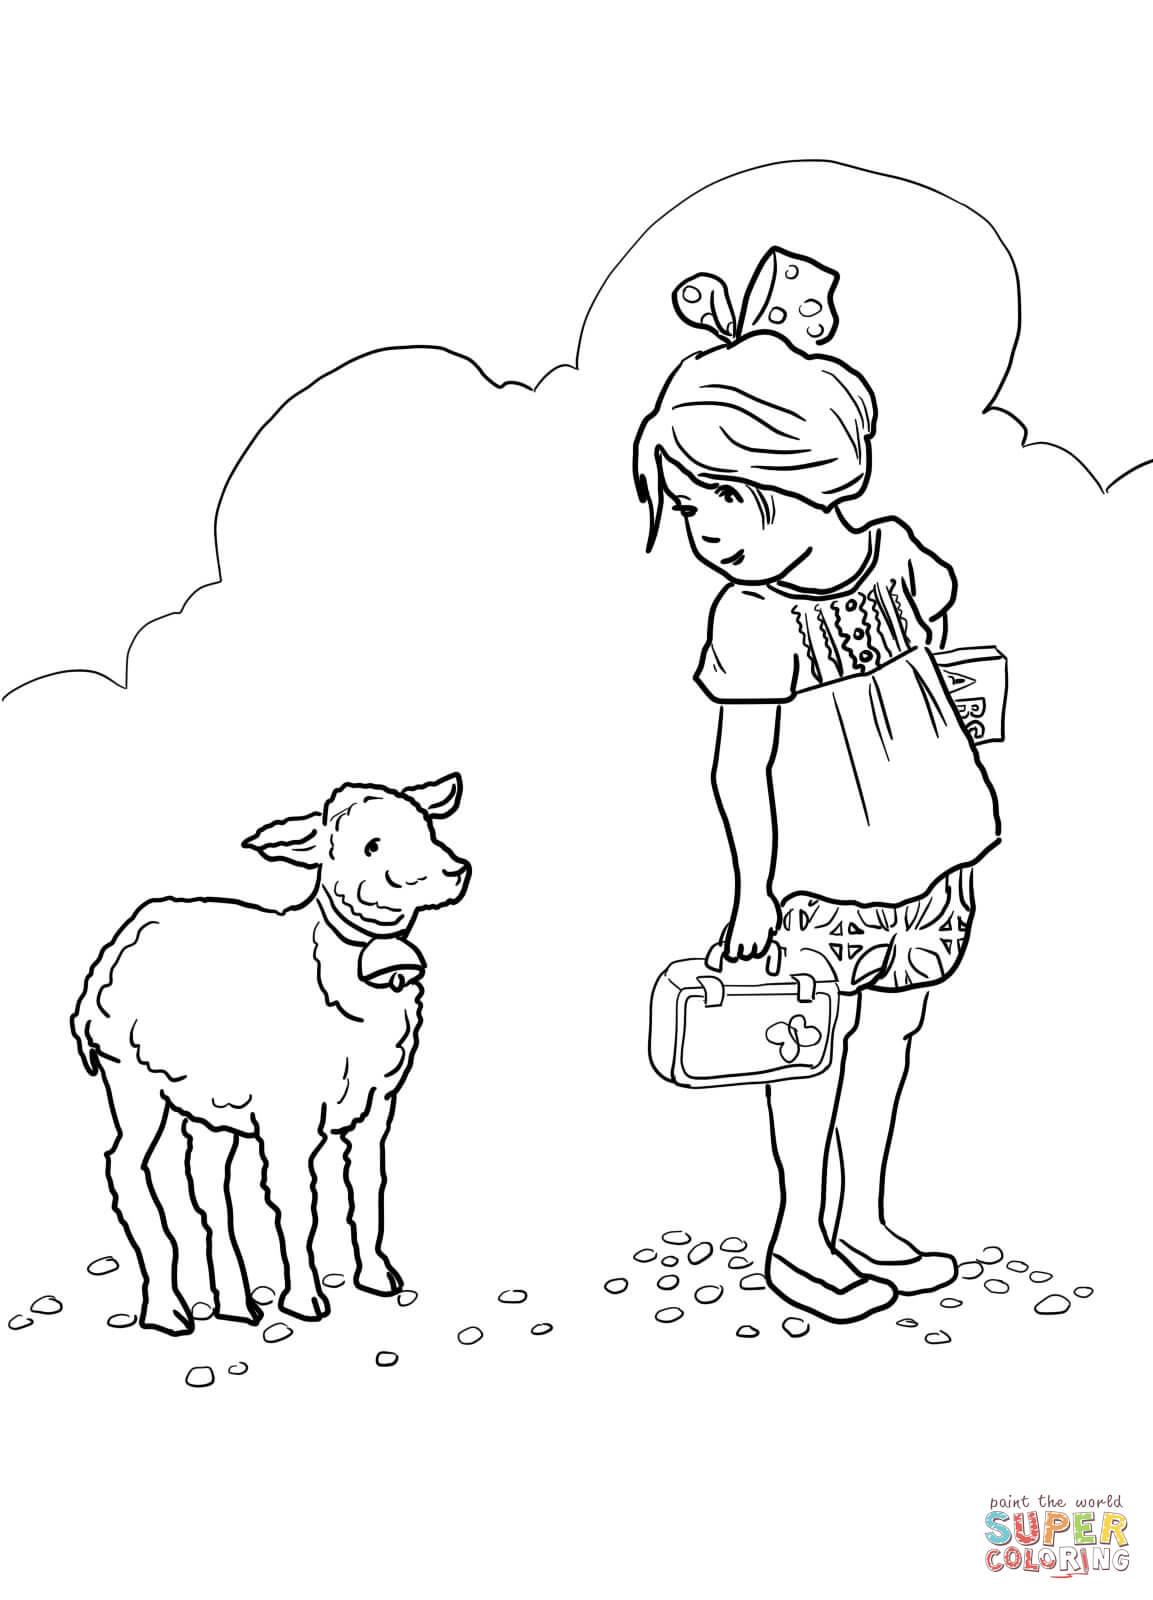 Ausmalbild Mary Had A Little Lamb Kinderlied